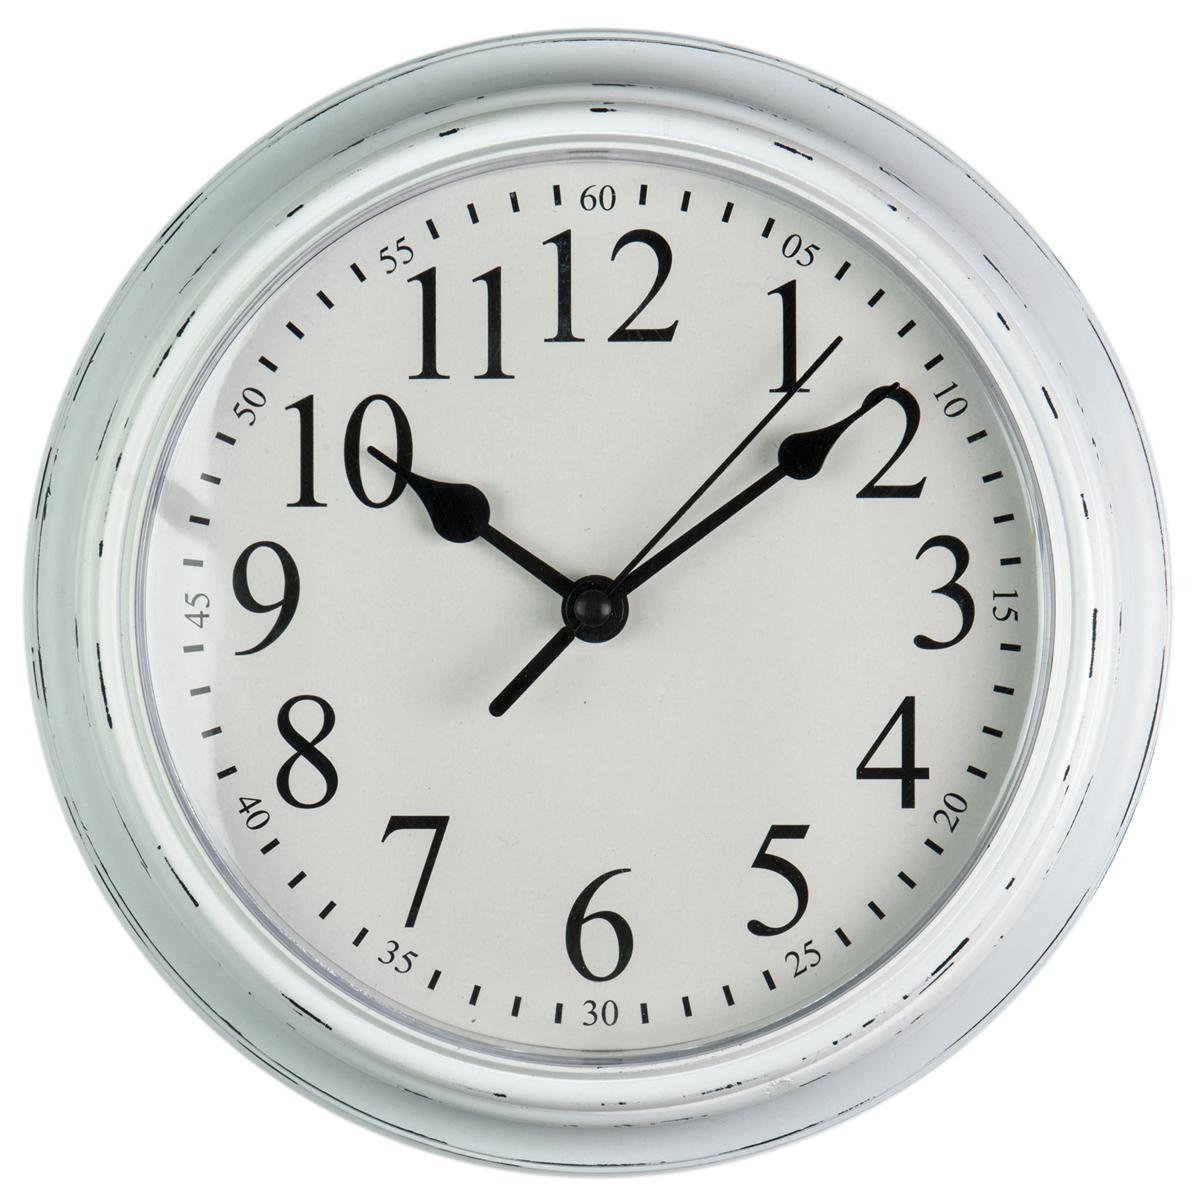 Часы настенные Miralight, 22,6 x 22,6 см. MC-3622AW meinl mc pts 12 x 12